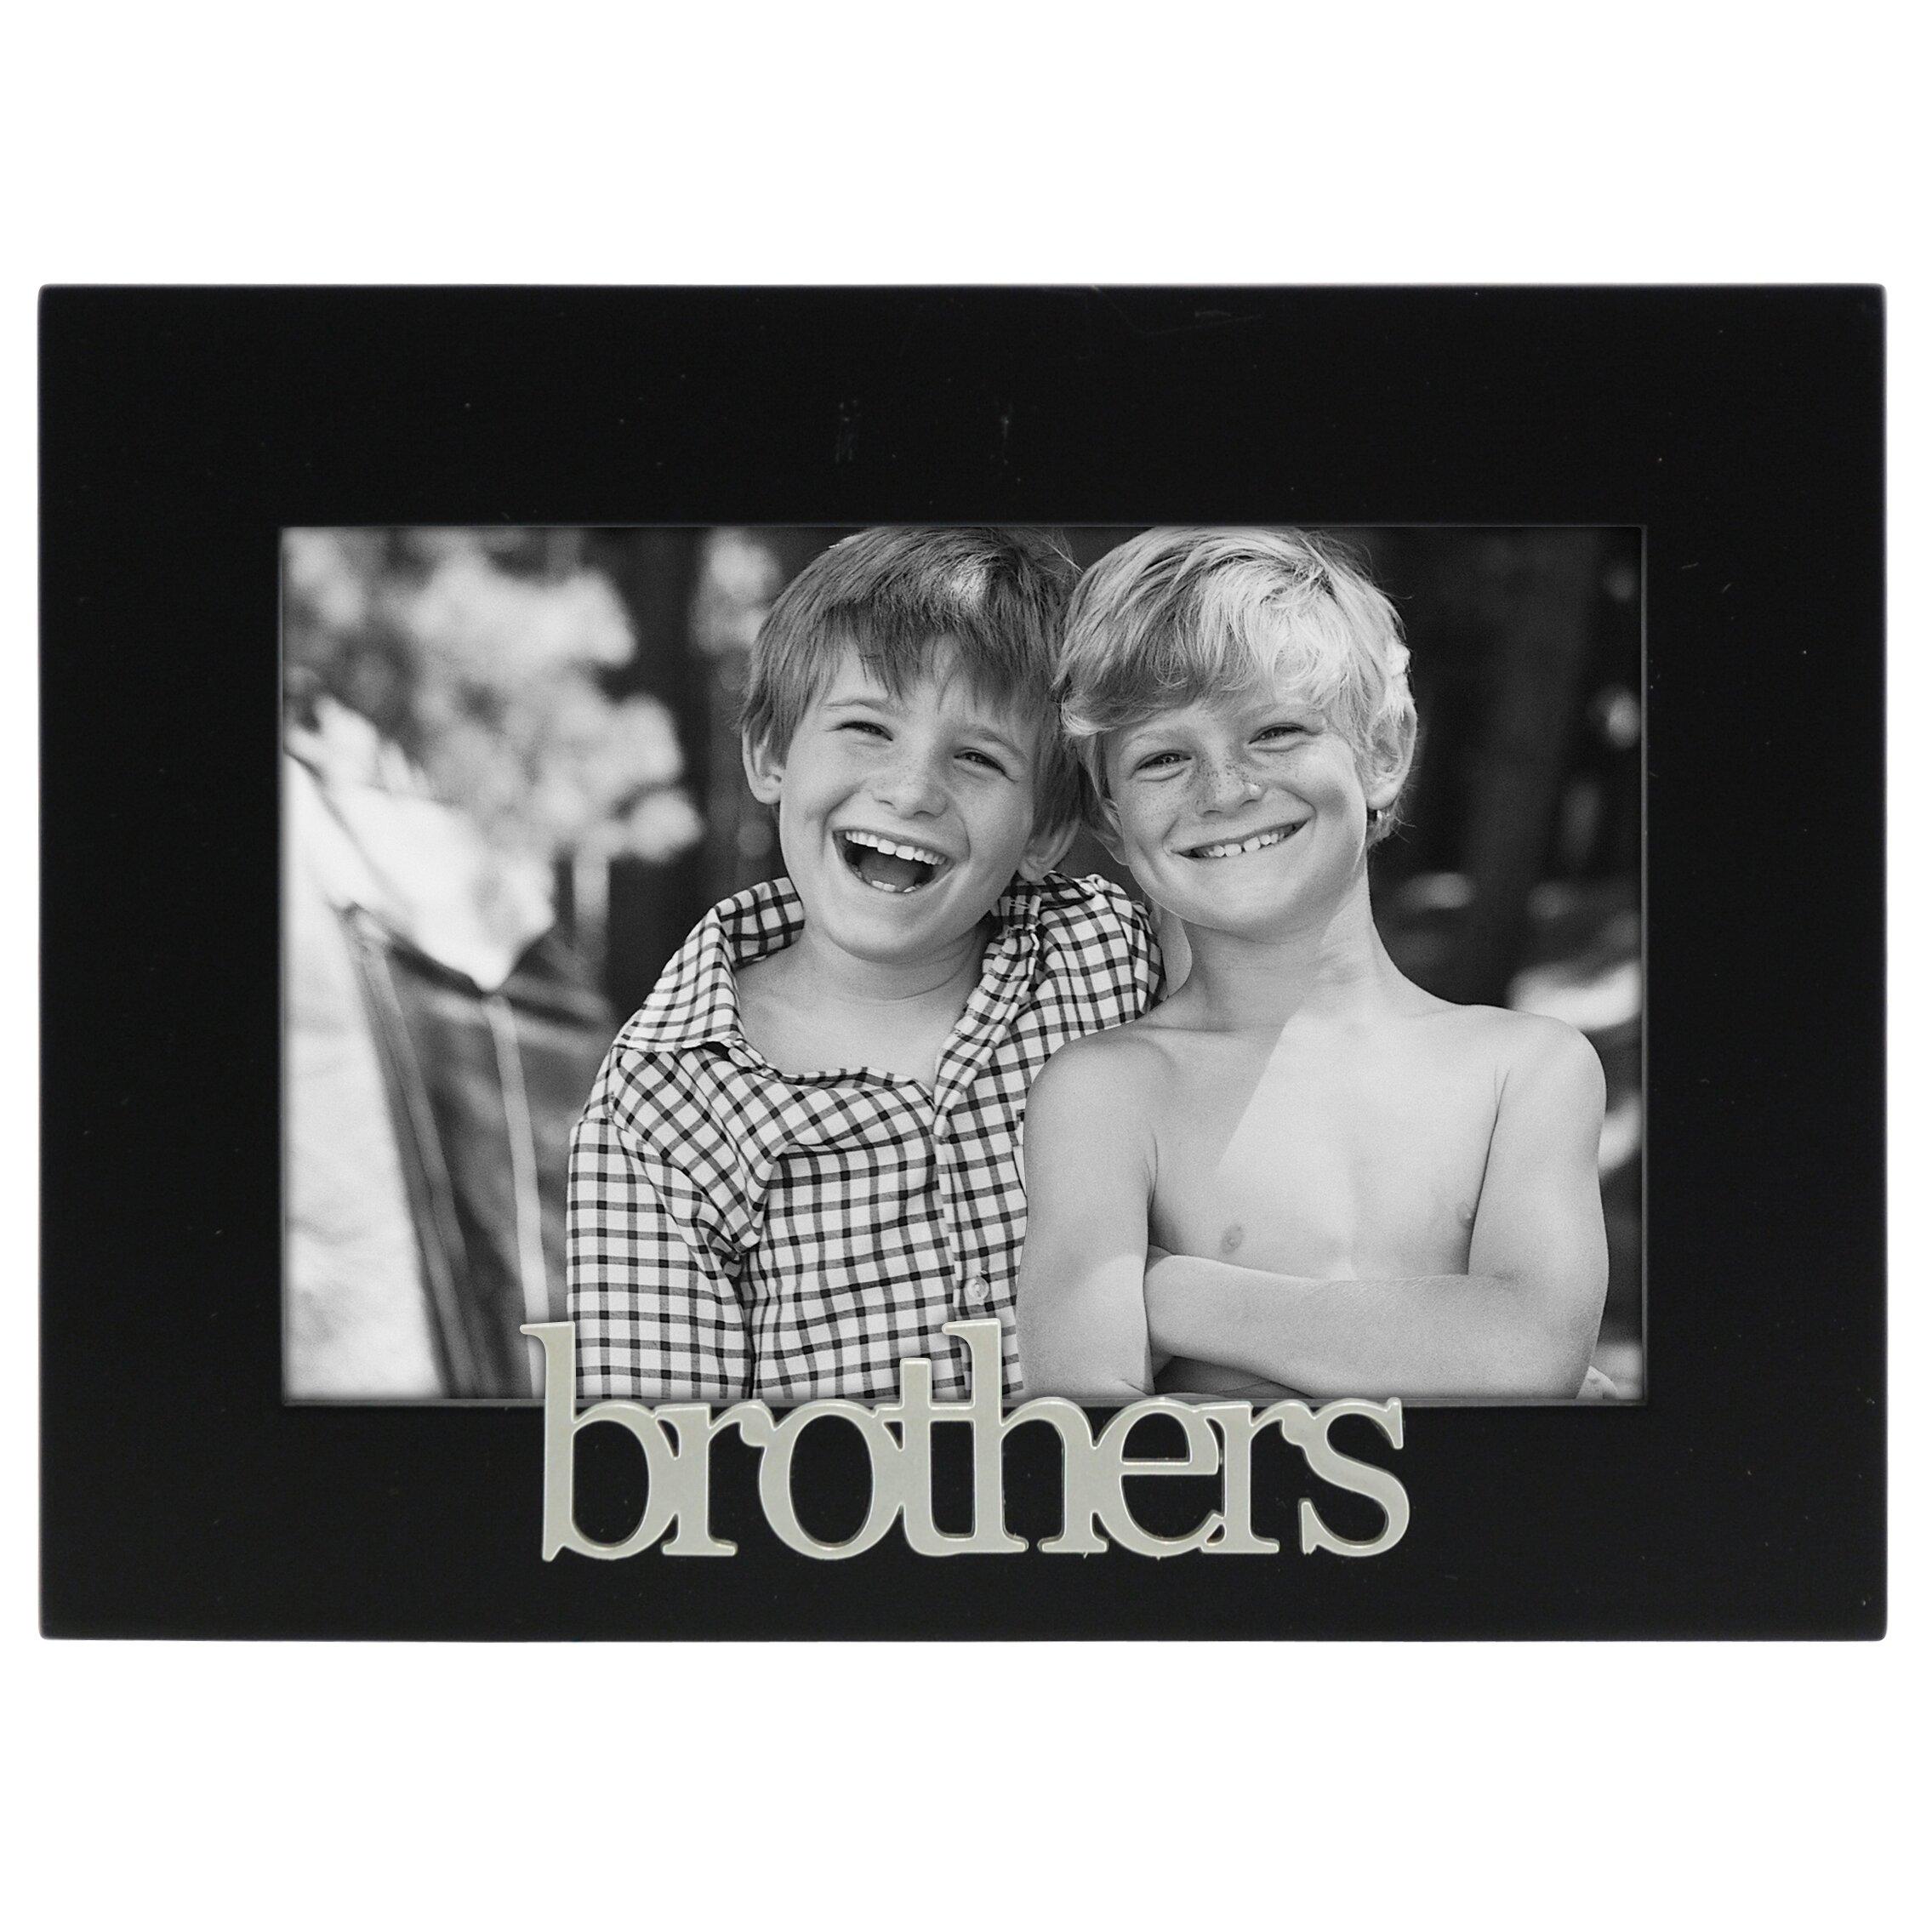 Sibling Photo Frames - Page 7 - Frame Design & Reviews ✓